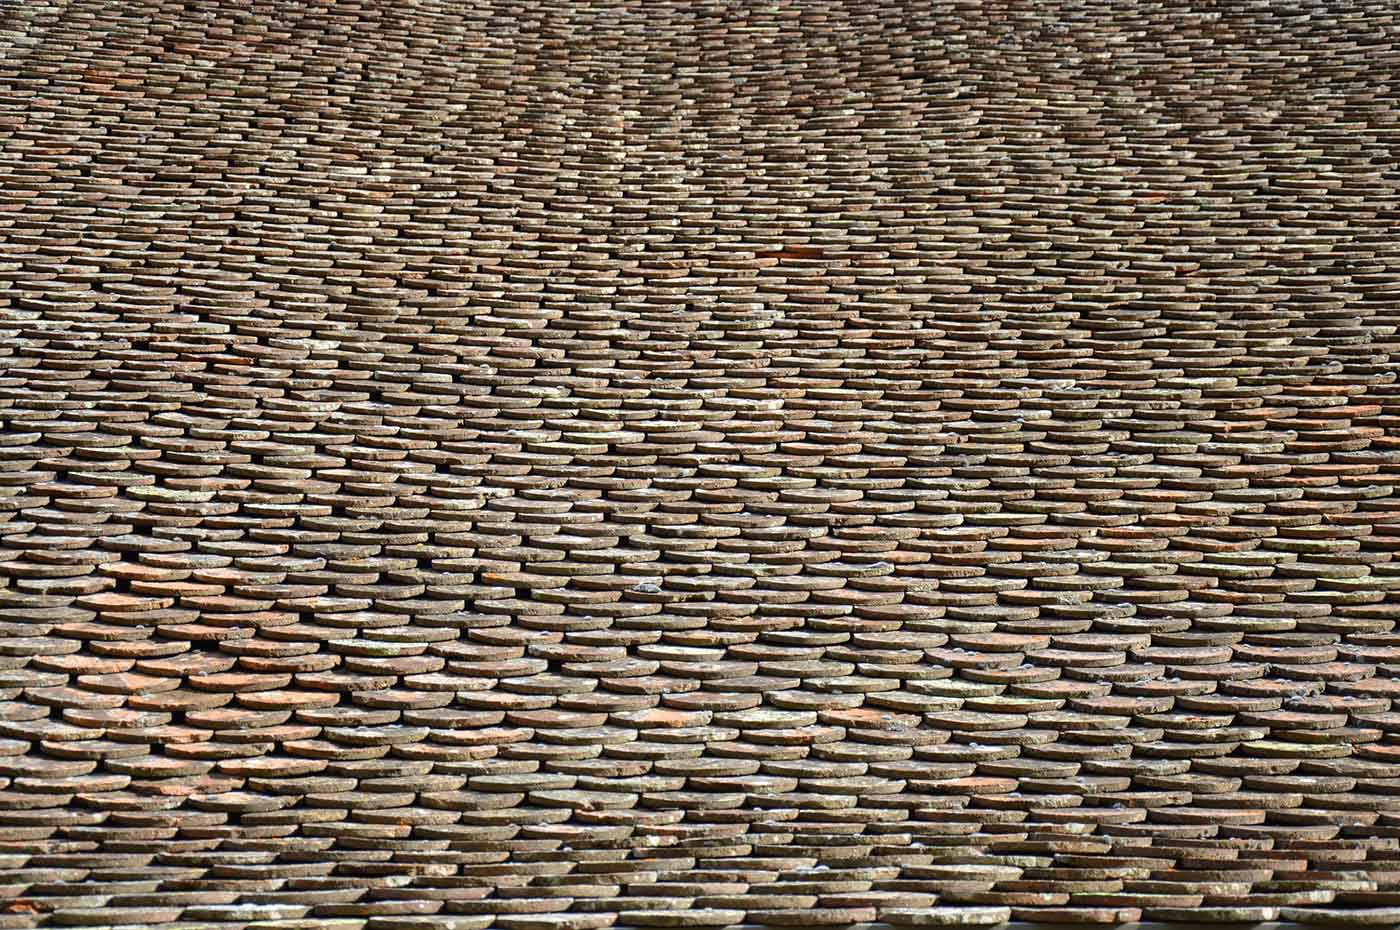 Rooftop shingles